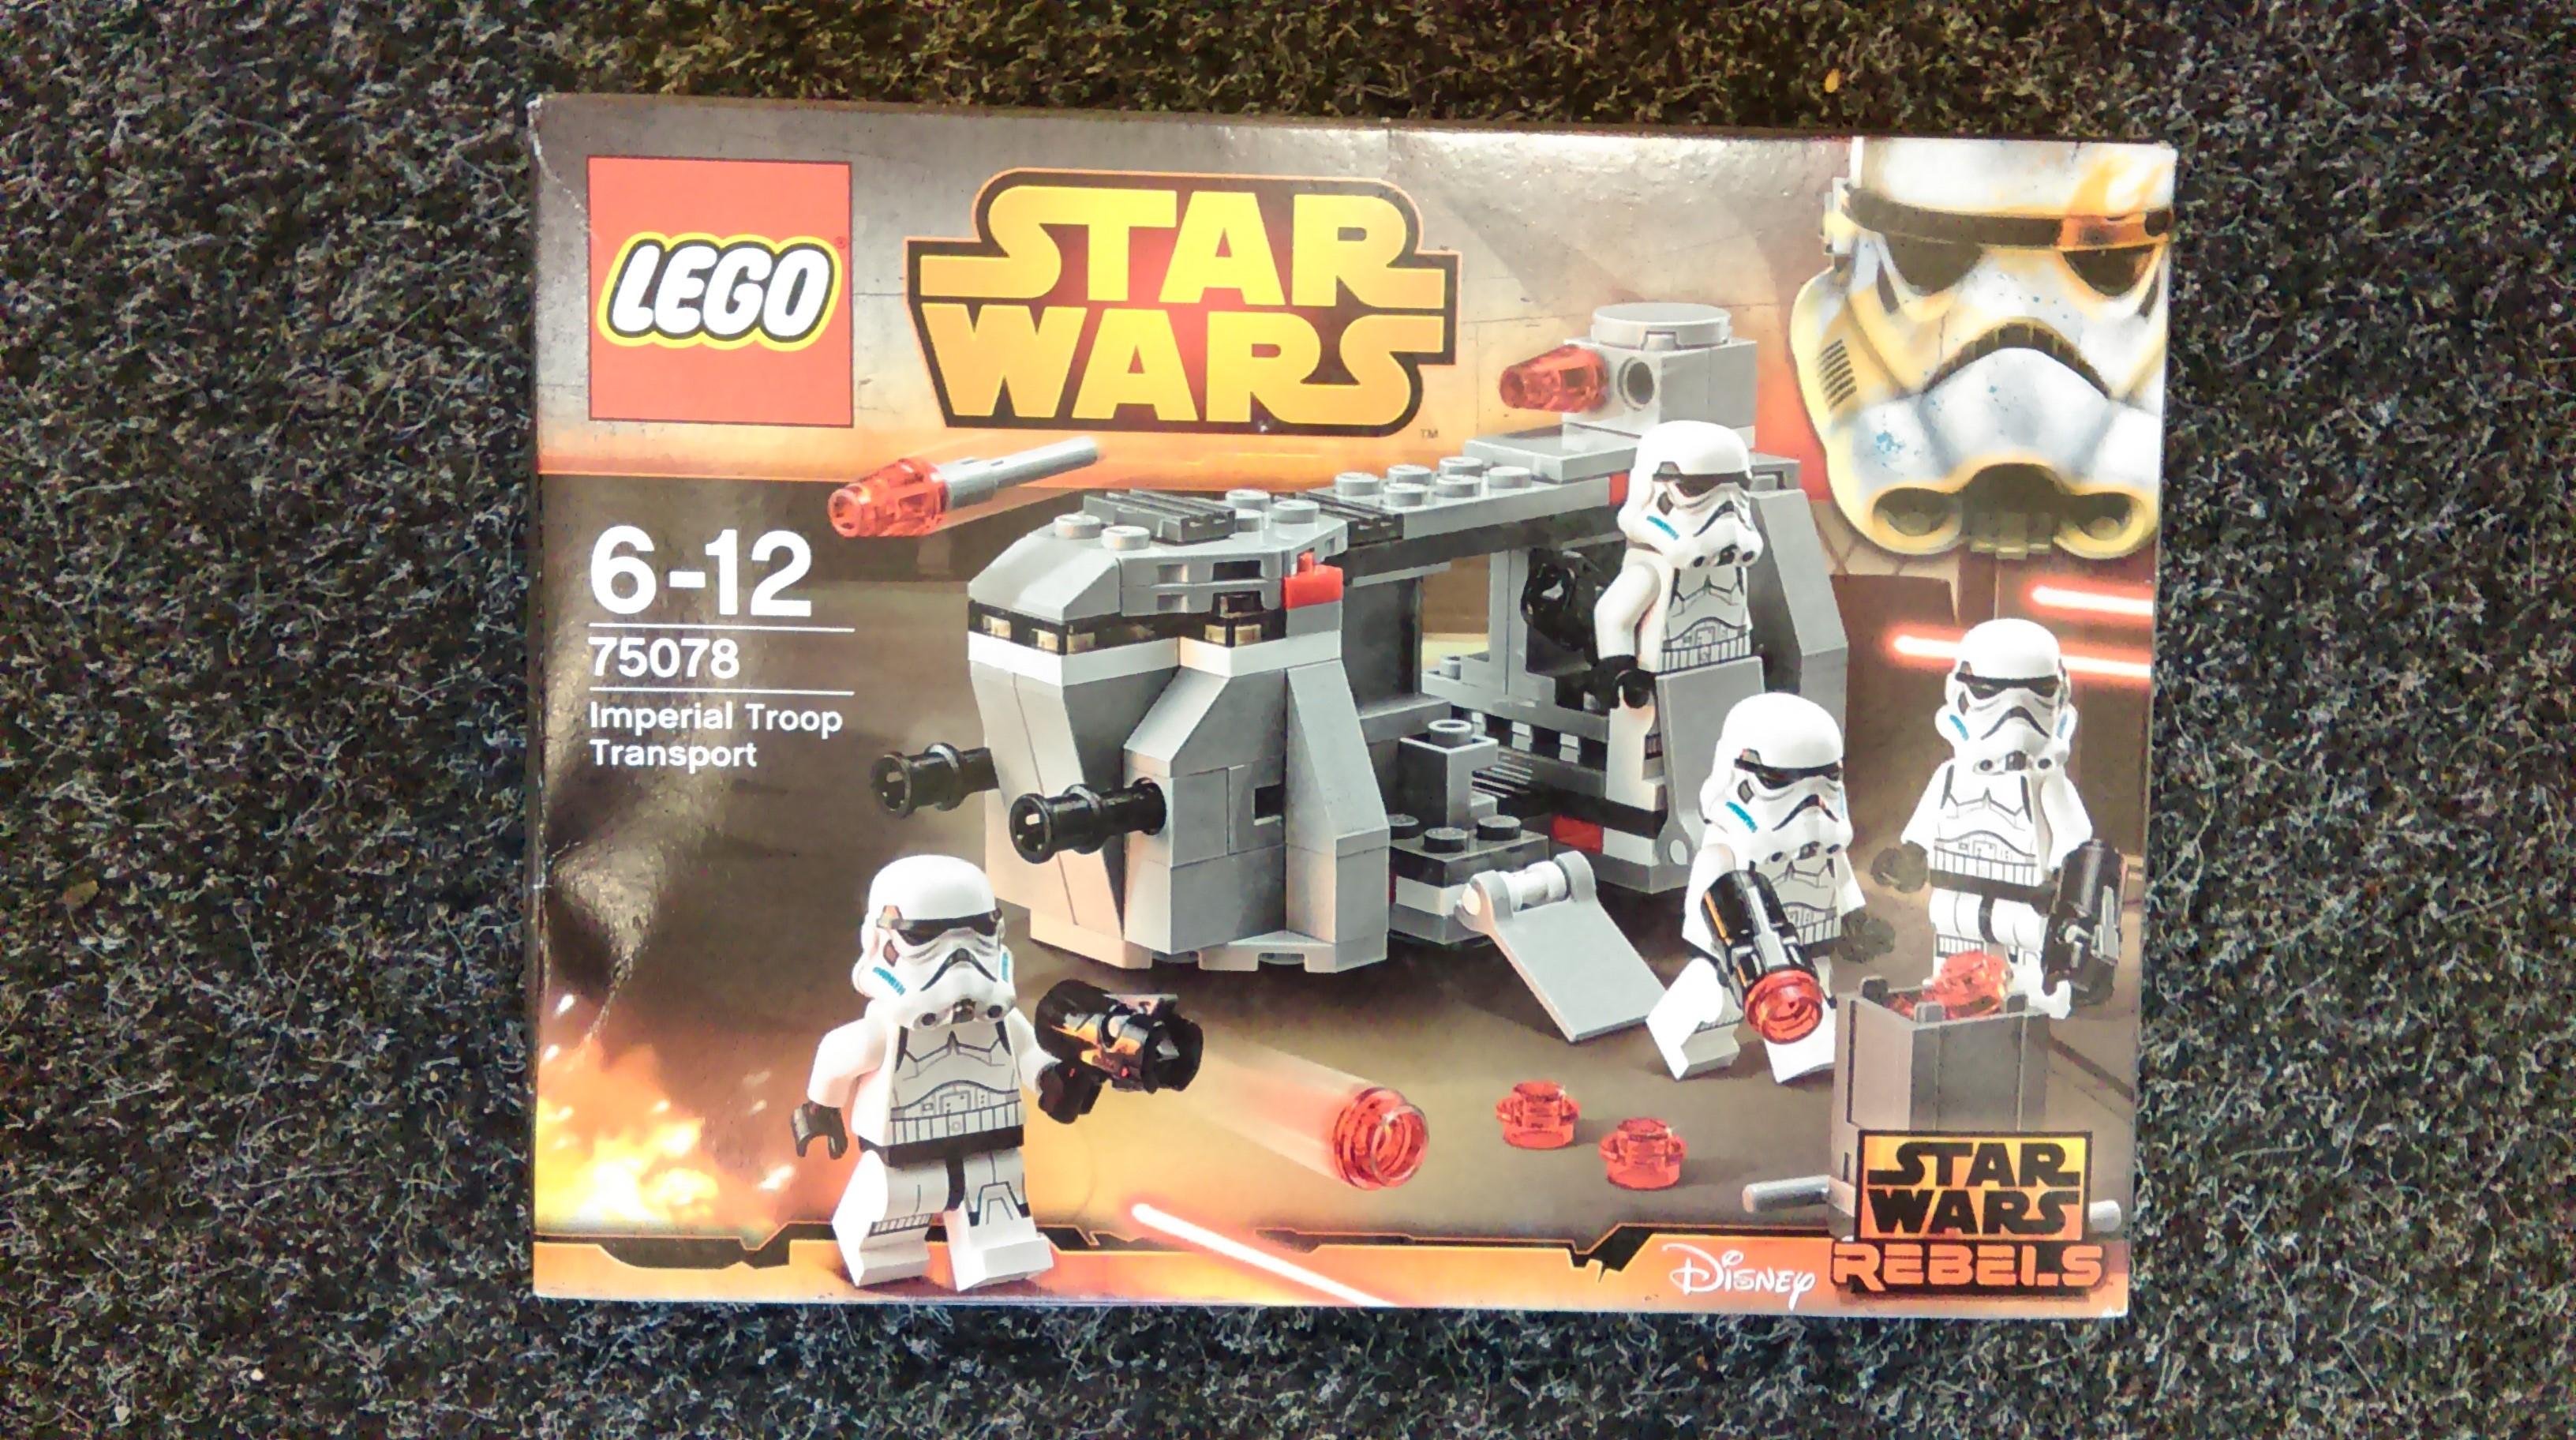 LEGO Star Wars 75078 Imperial Troop Transport